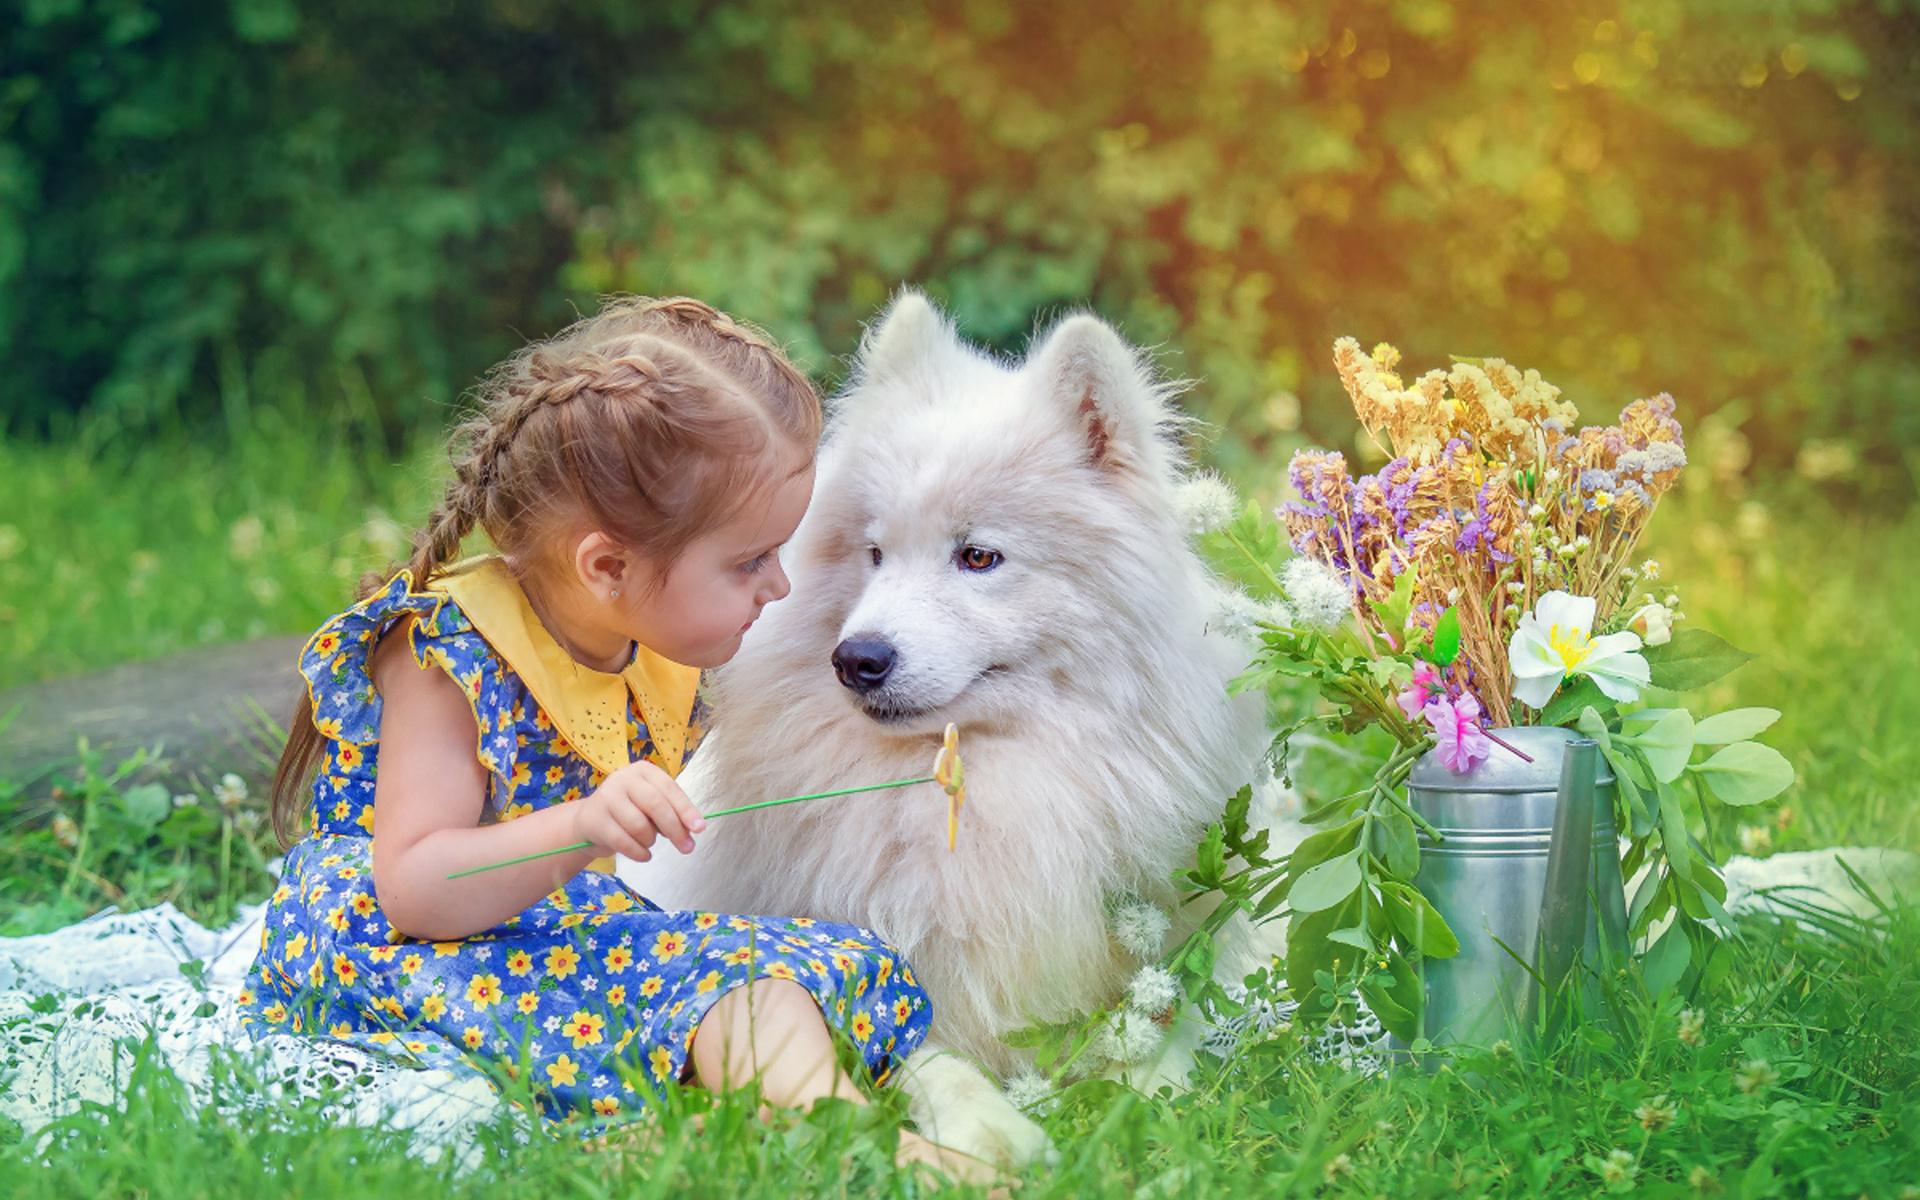 Картинки дети на природе с животными